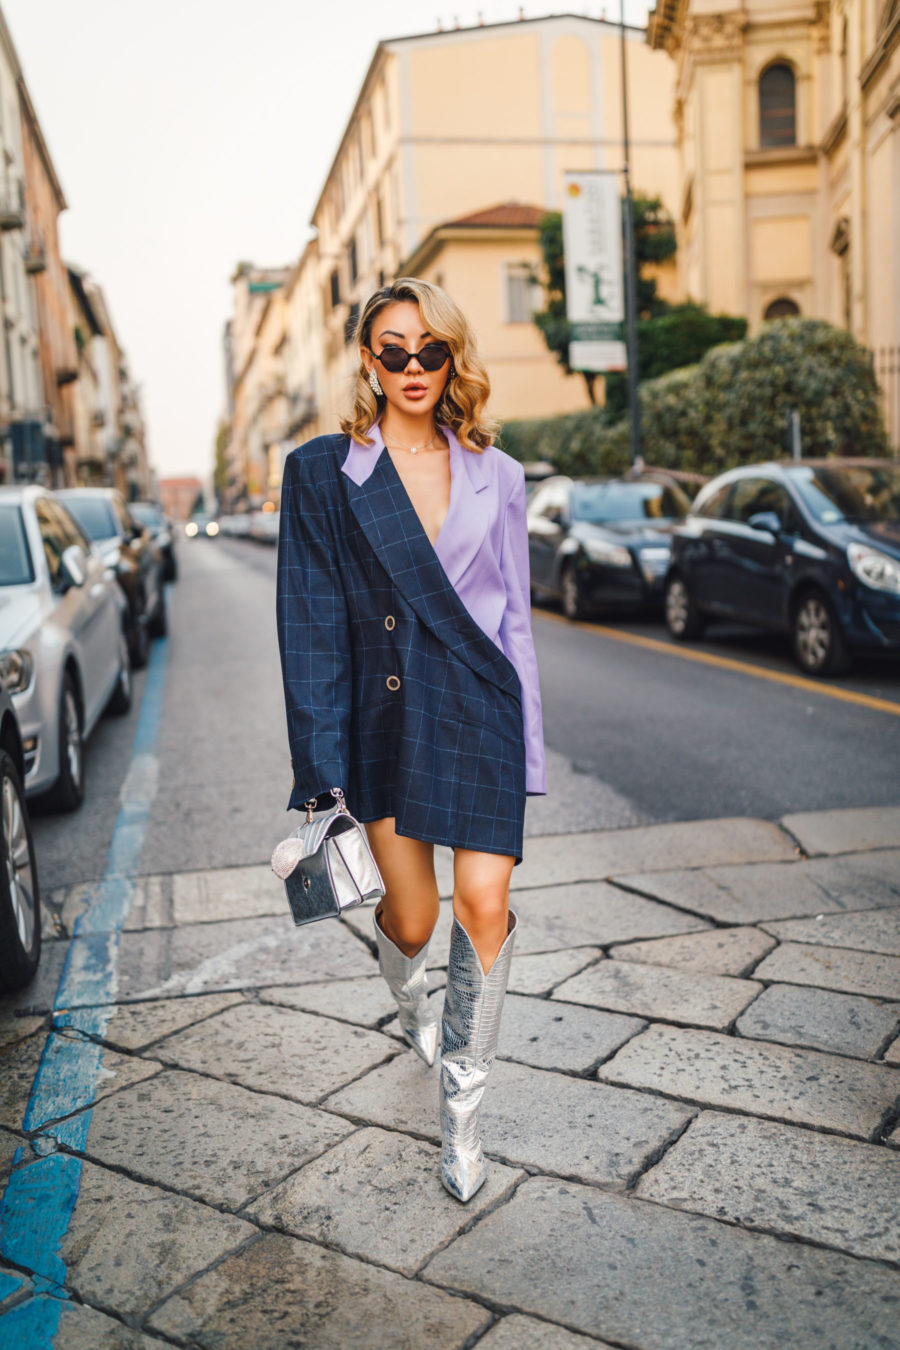 fashion blogger jessica wang shares favorite winter fashion brands wearing leather skirt, black knit sweater, handbag, paris texas metallic boots // Notjessfashion.com